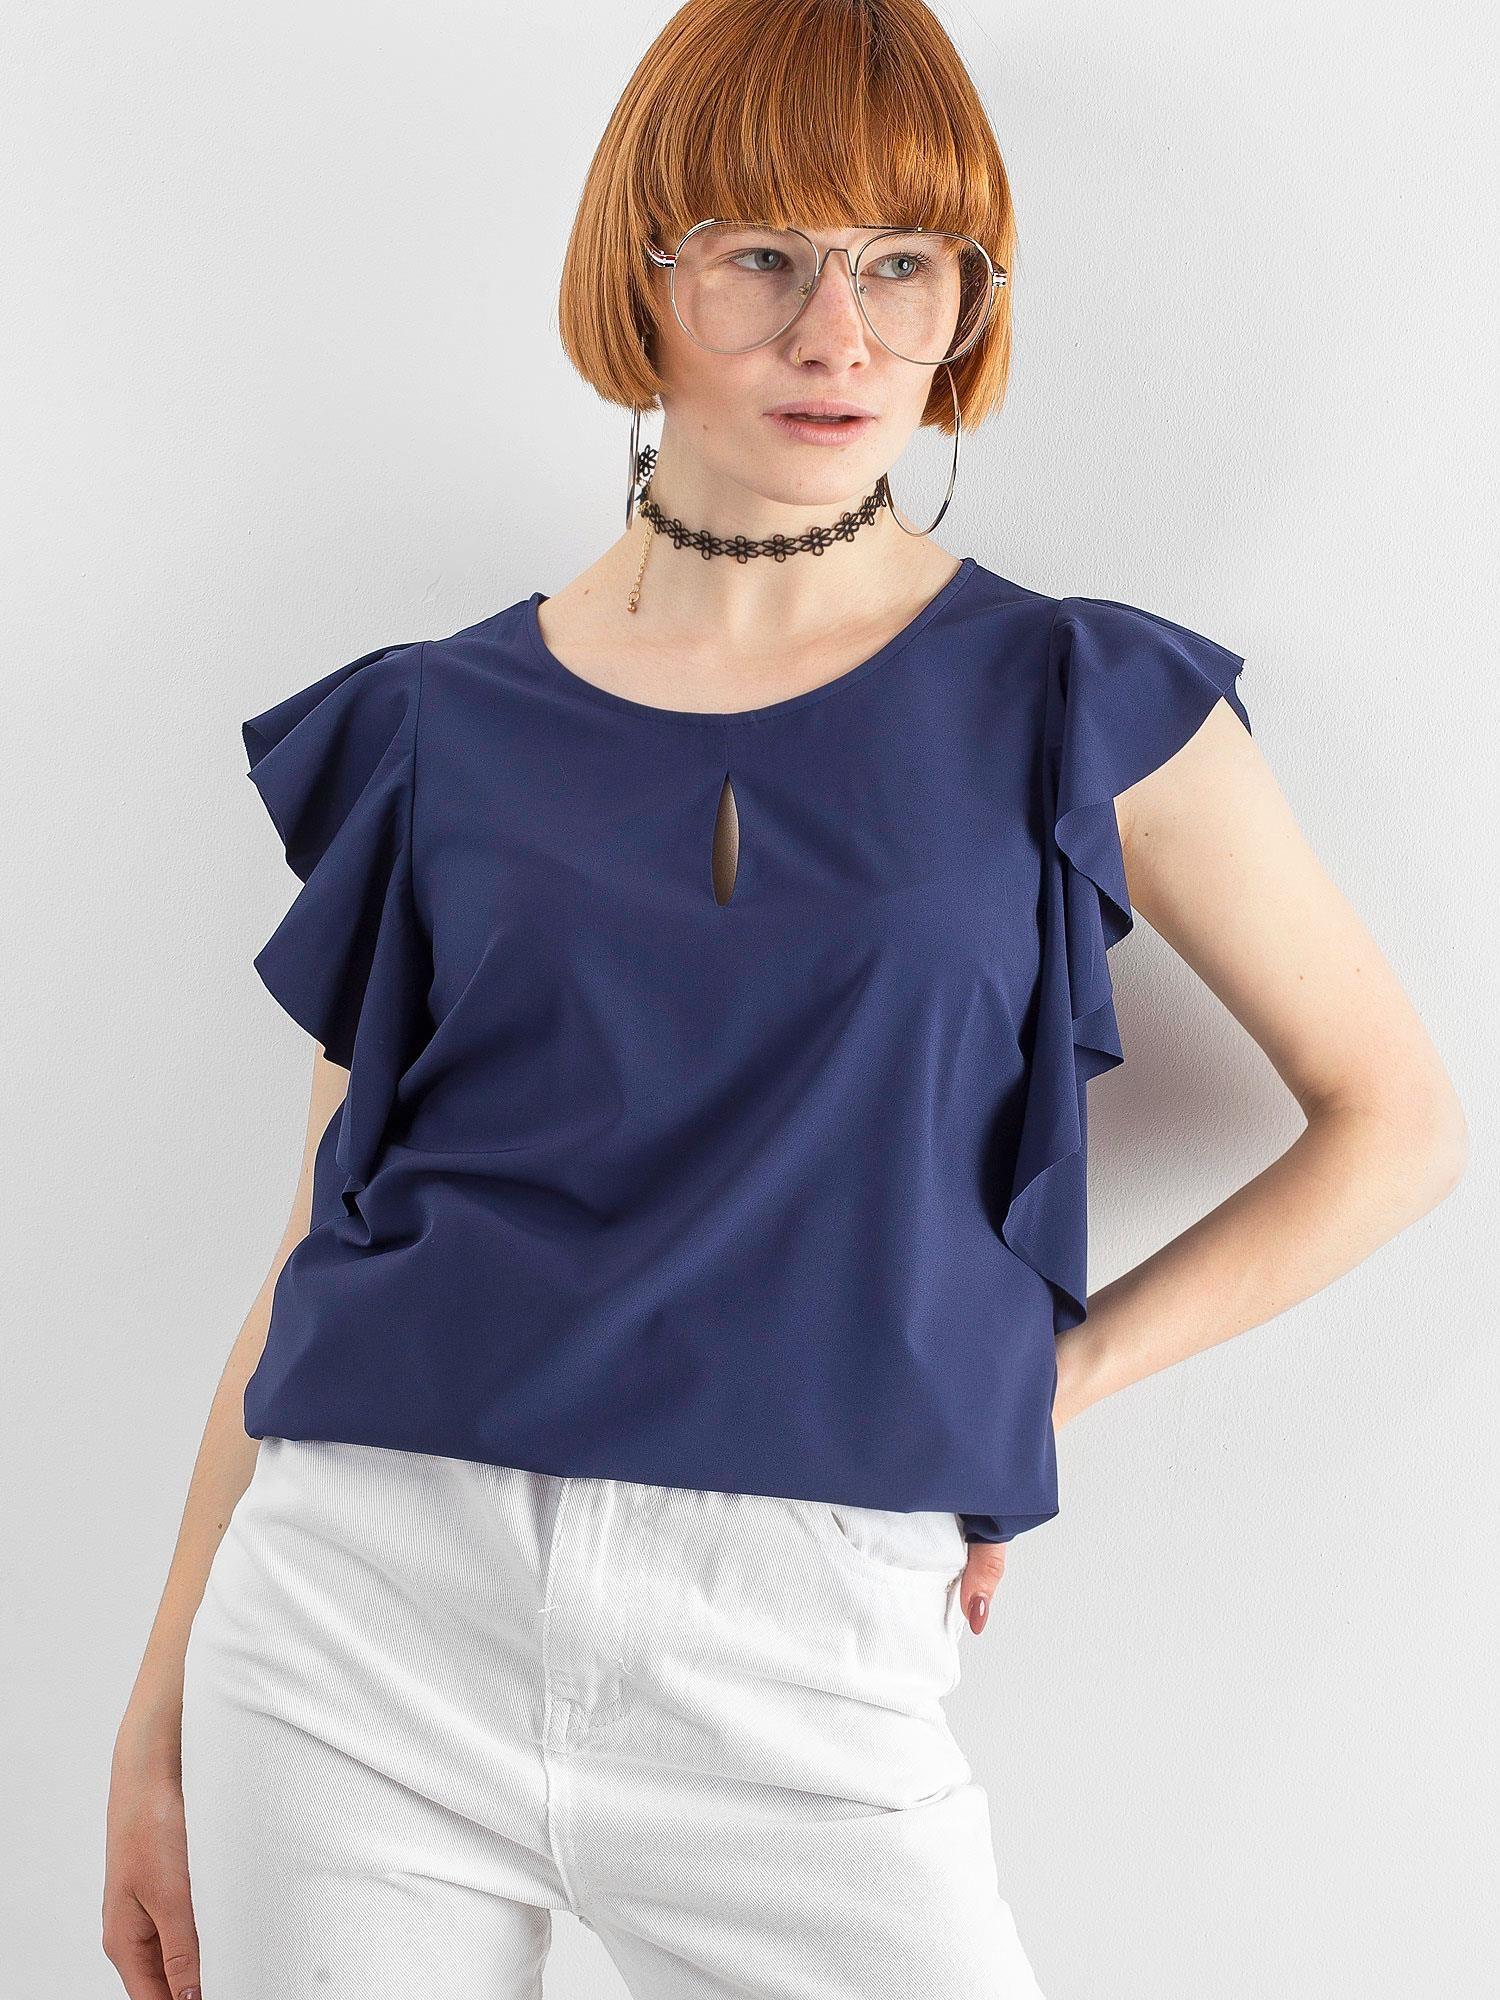 e05012dff3b4dd Granatowa bluzka z falbanami - Bluzka na co dzień - sklep eButik.pl